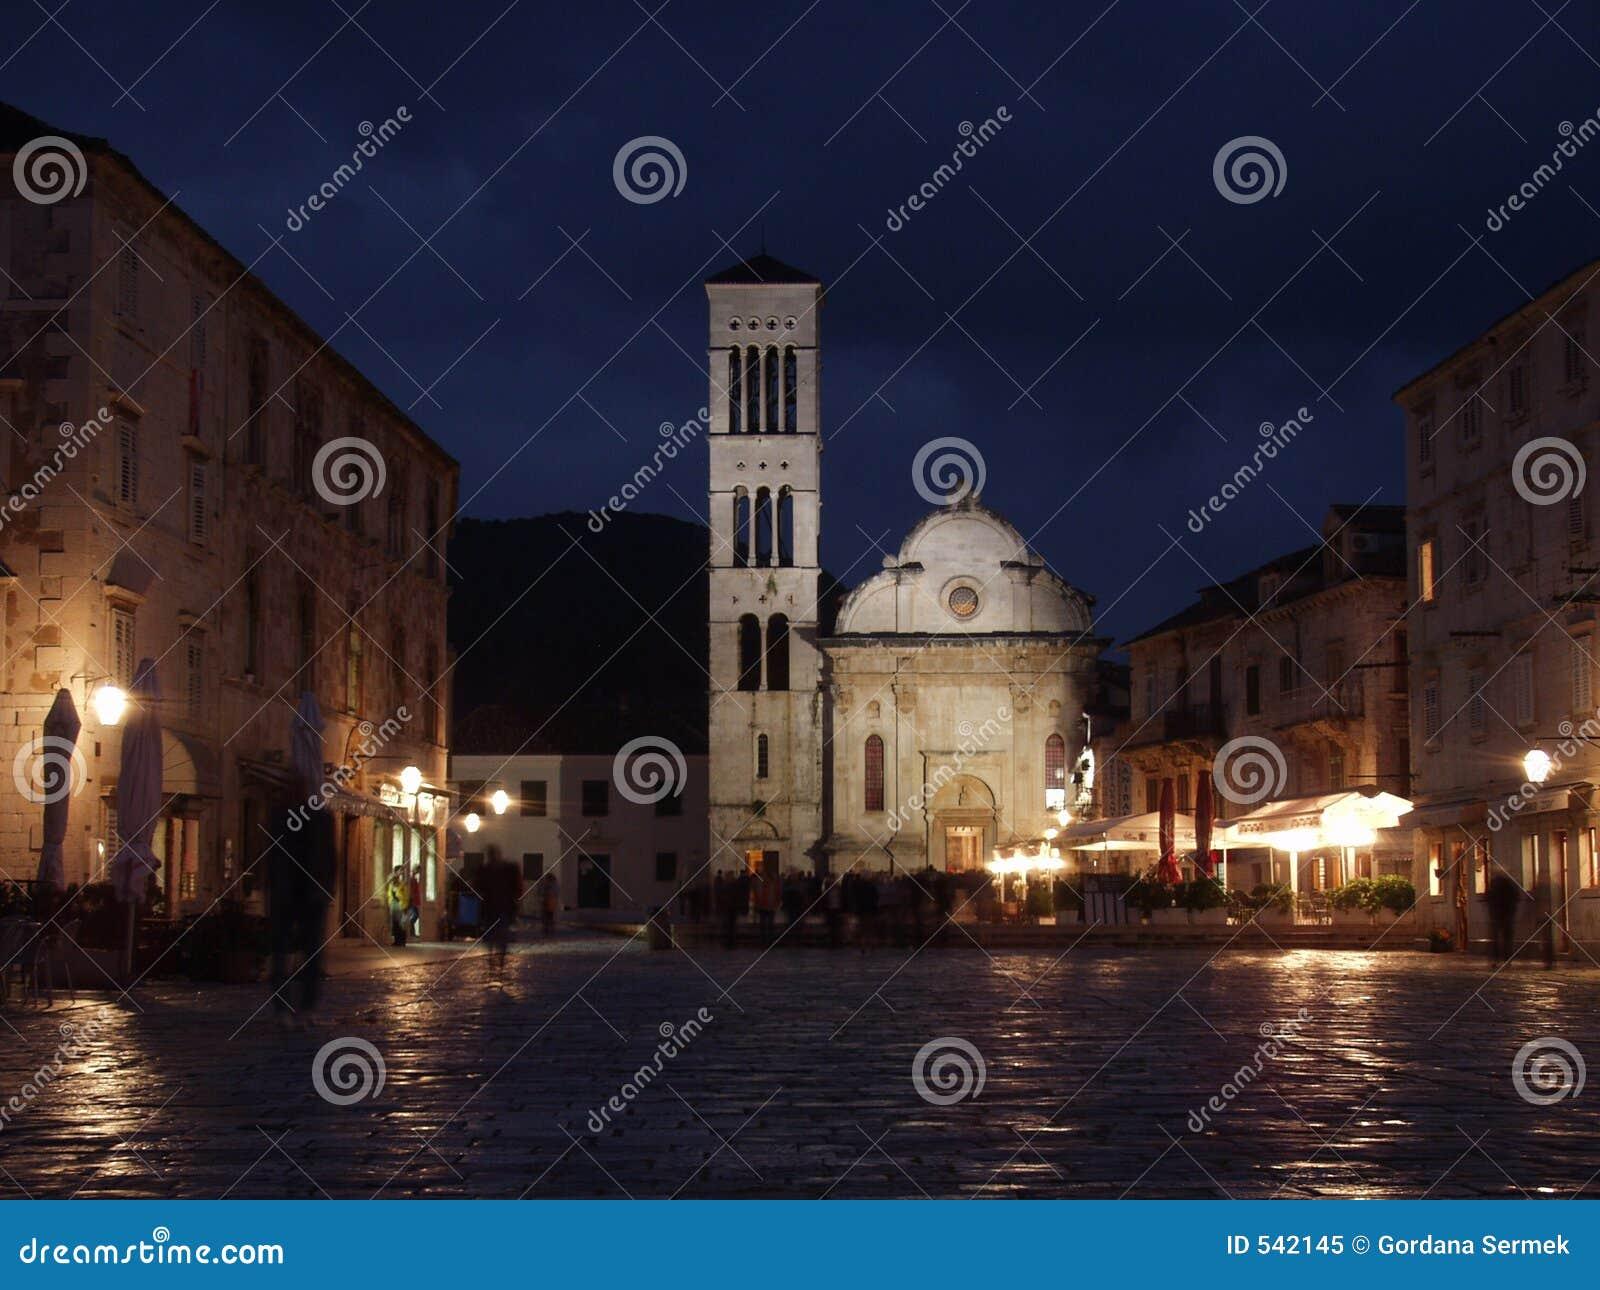 Download 大教堂hvar海岛主要市场 库存图片. 图片 包括有 中世纪, 晚上, 地中海, 大教堂, 宗教信仰, 教会 - 542145